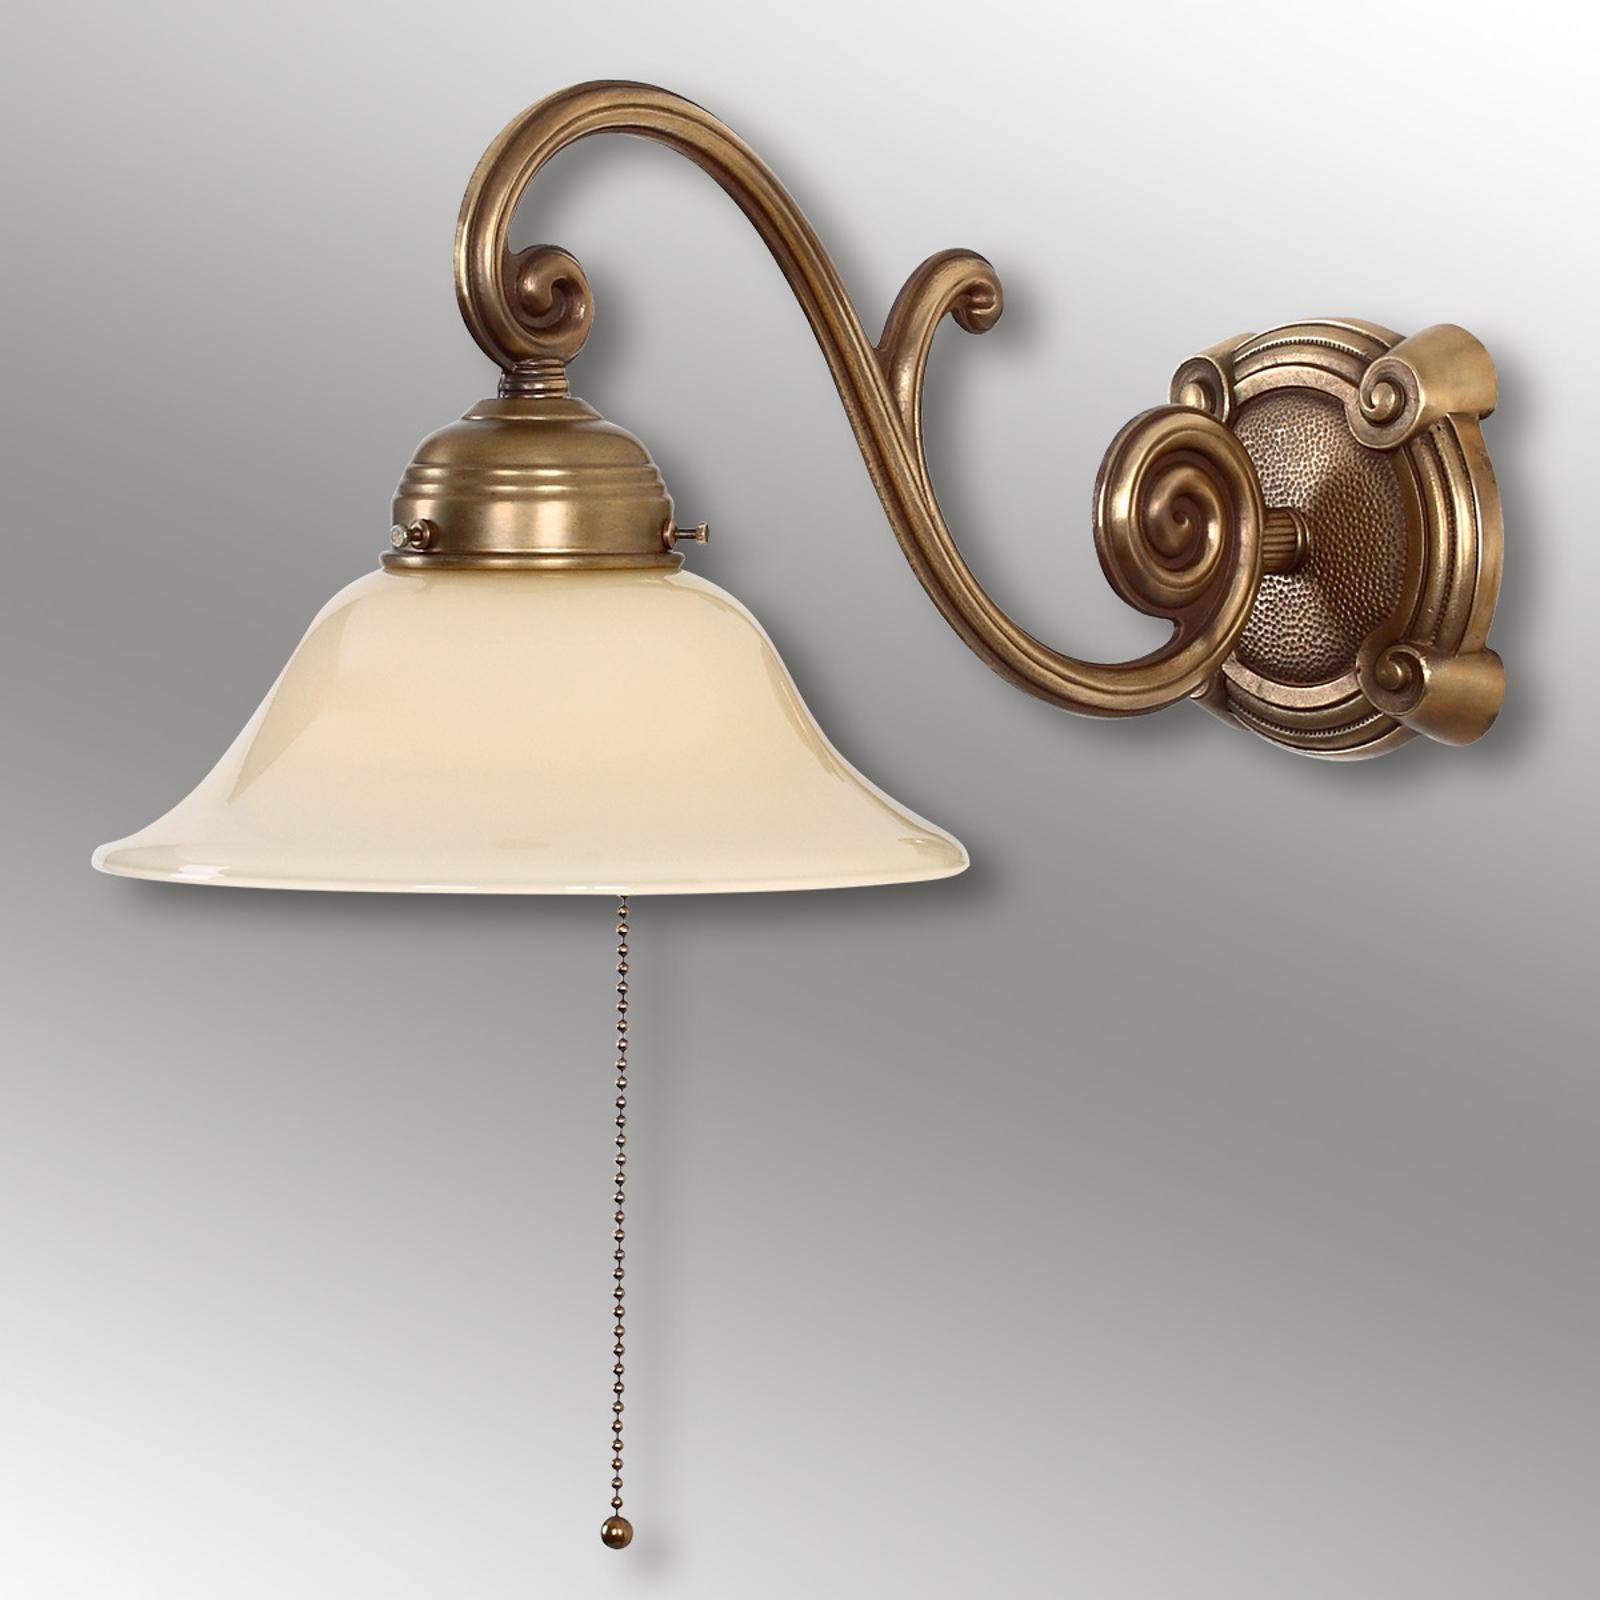 Ella antique-designed wall light made of brass_1542138_1